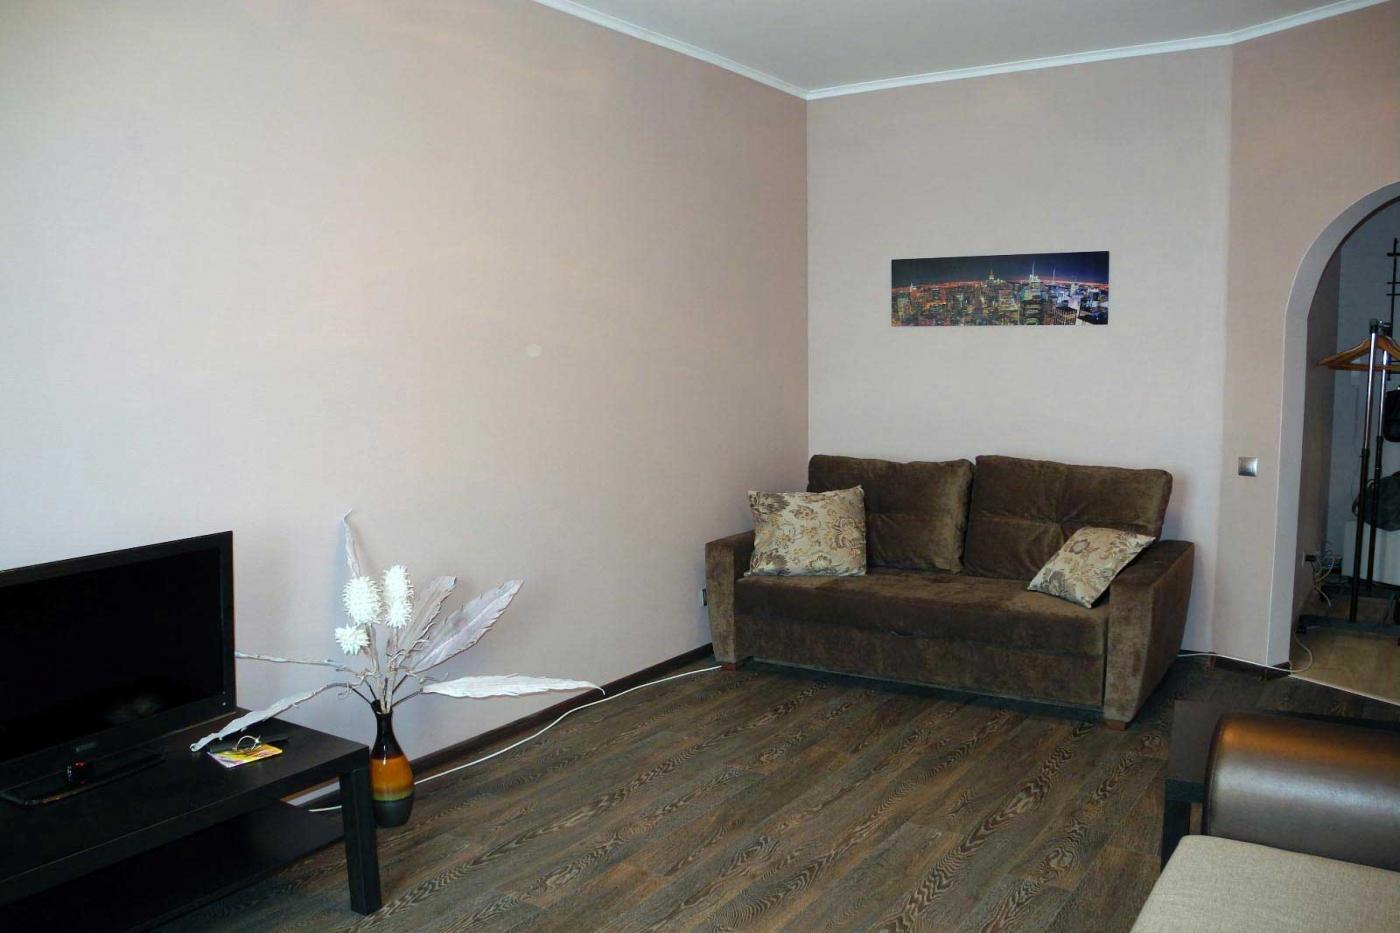 1-комнатная квартира посуточно (вариант № 3875), ул. Ленинский проспект, фото № 4